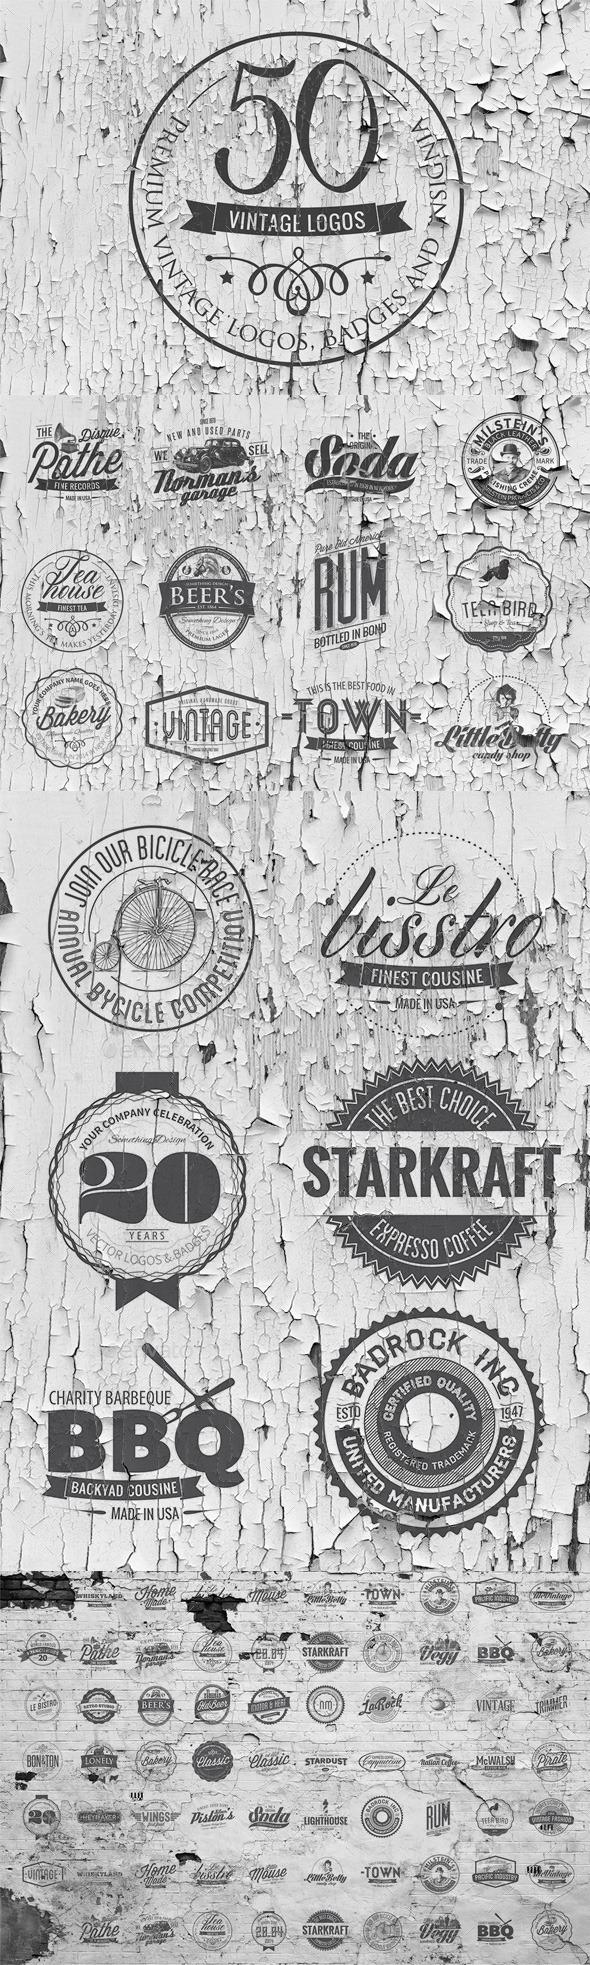 GraphicRiver 50 Vintage Logos Templates 11407268